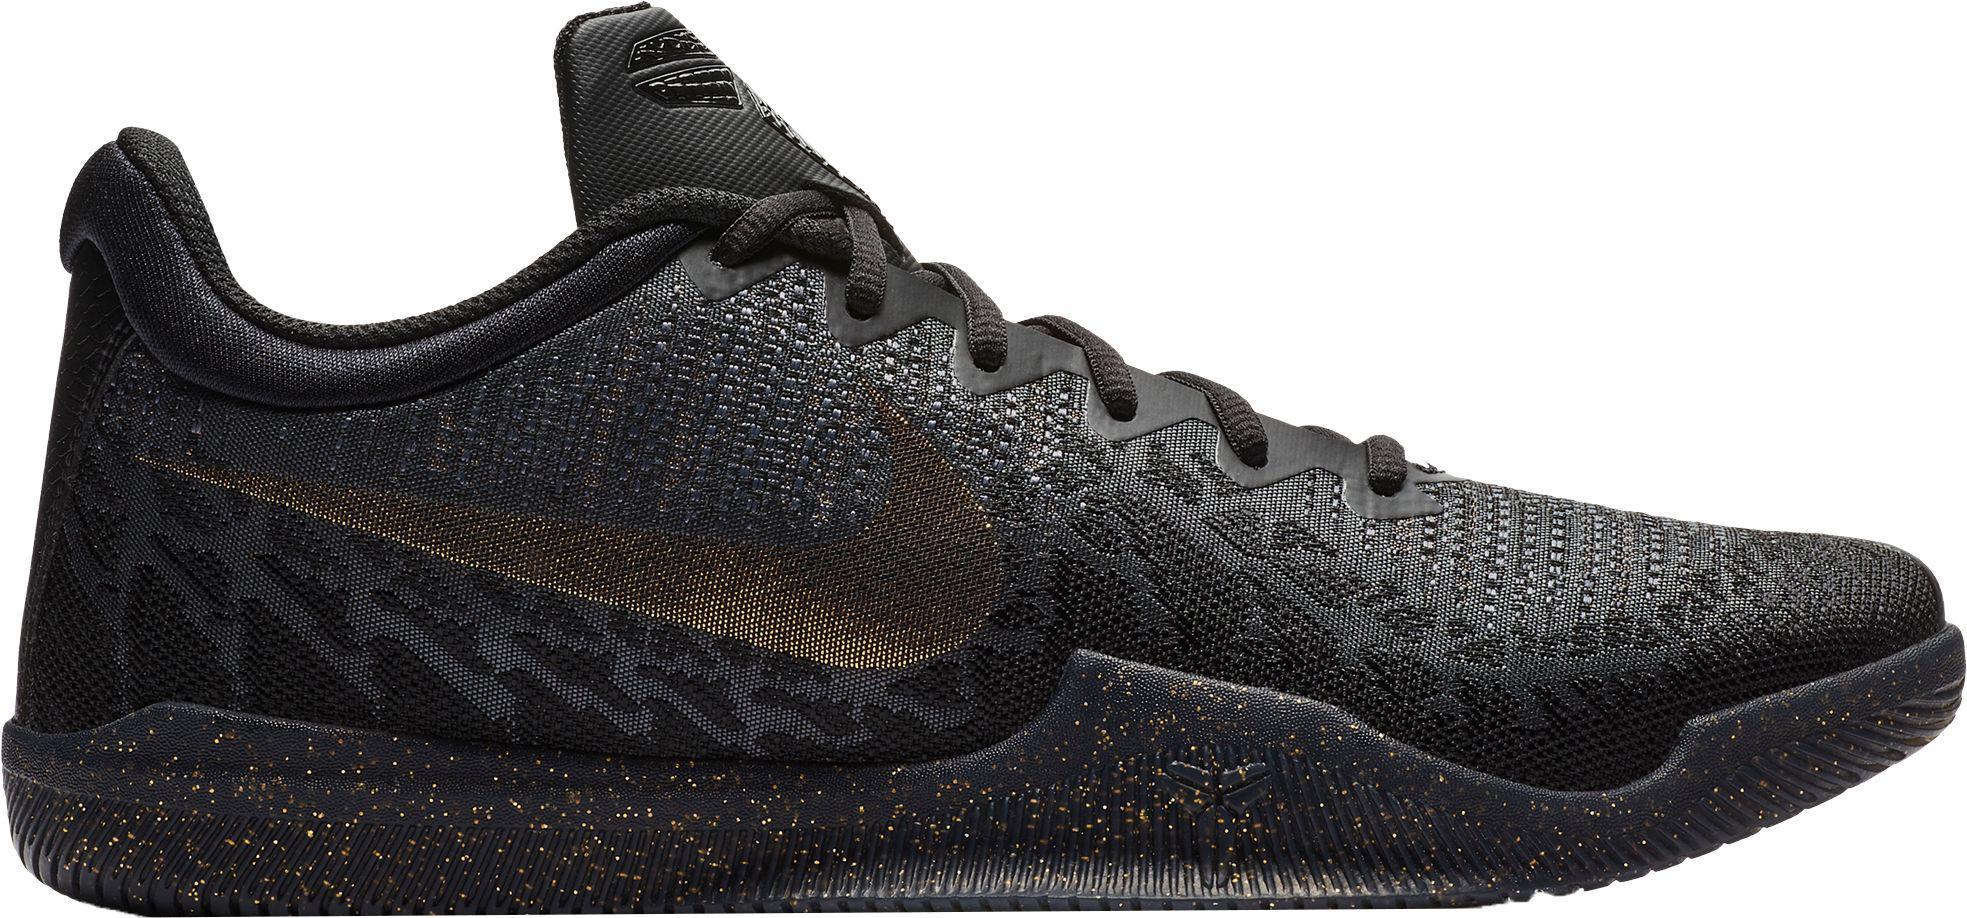 low priced b2a16 5a112 View fullscreen · Nike - Black Kobe Mamba Rage Basketball Shoes for Men -  Lyst